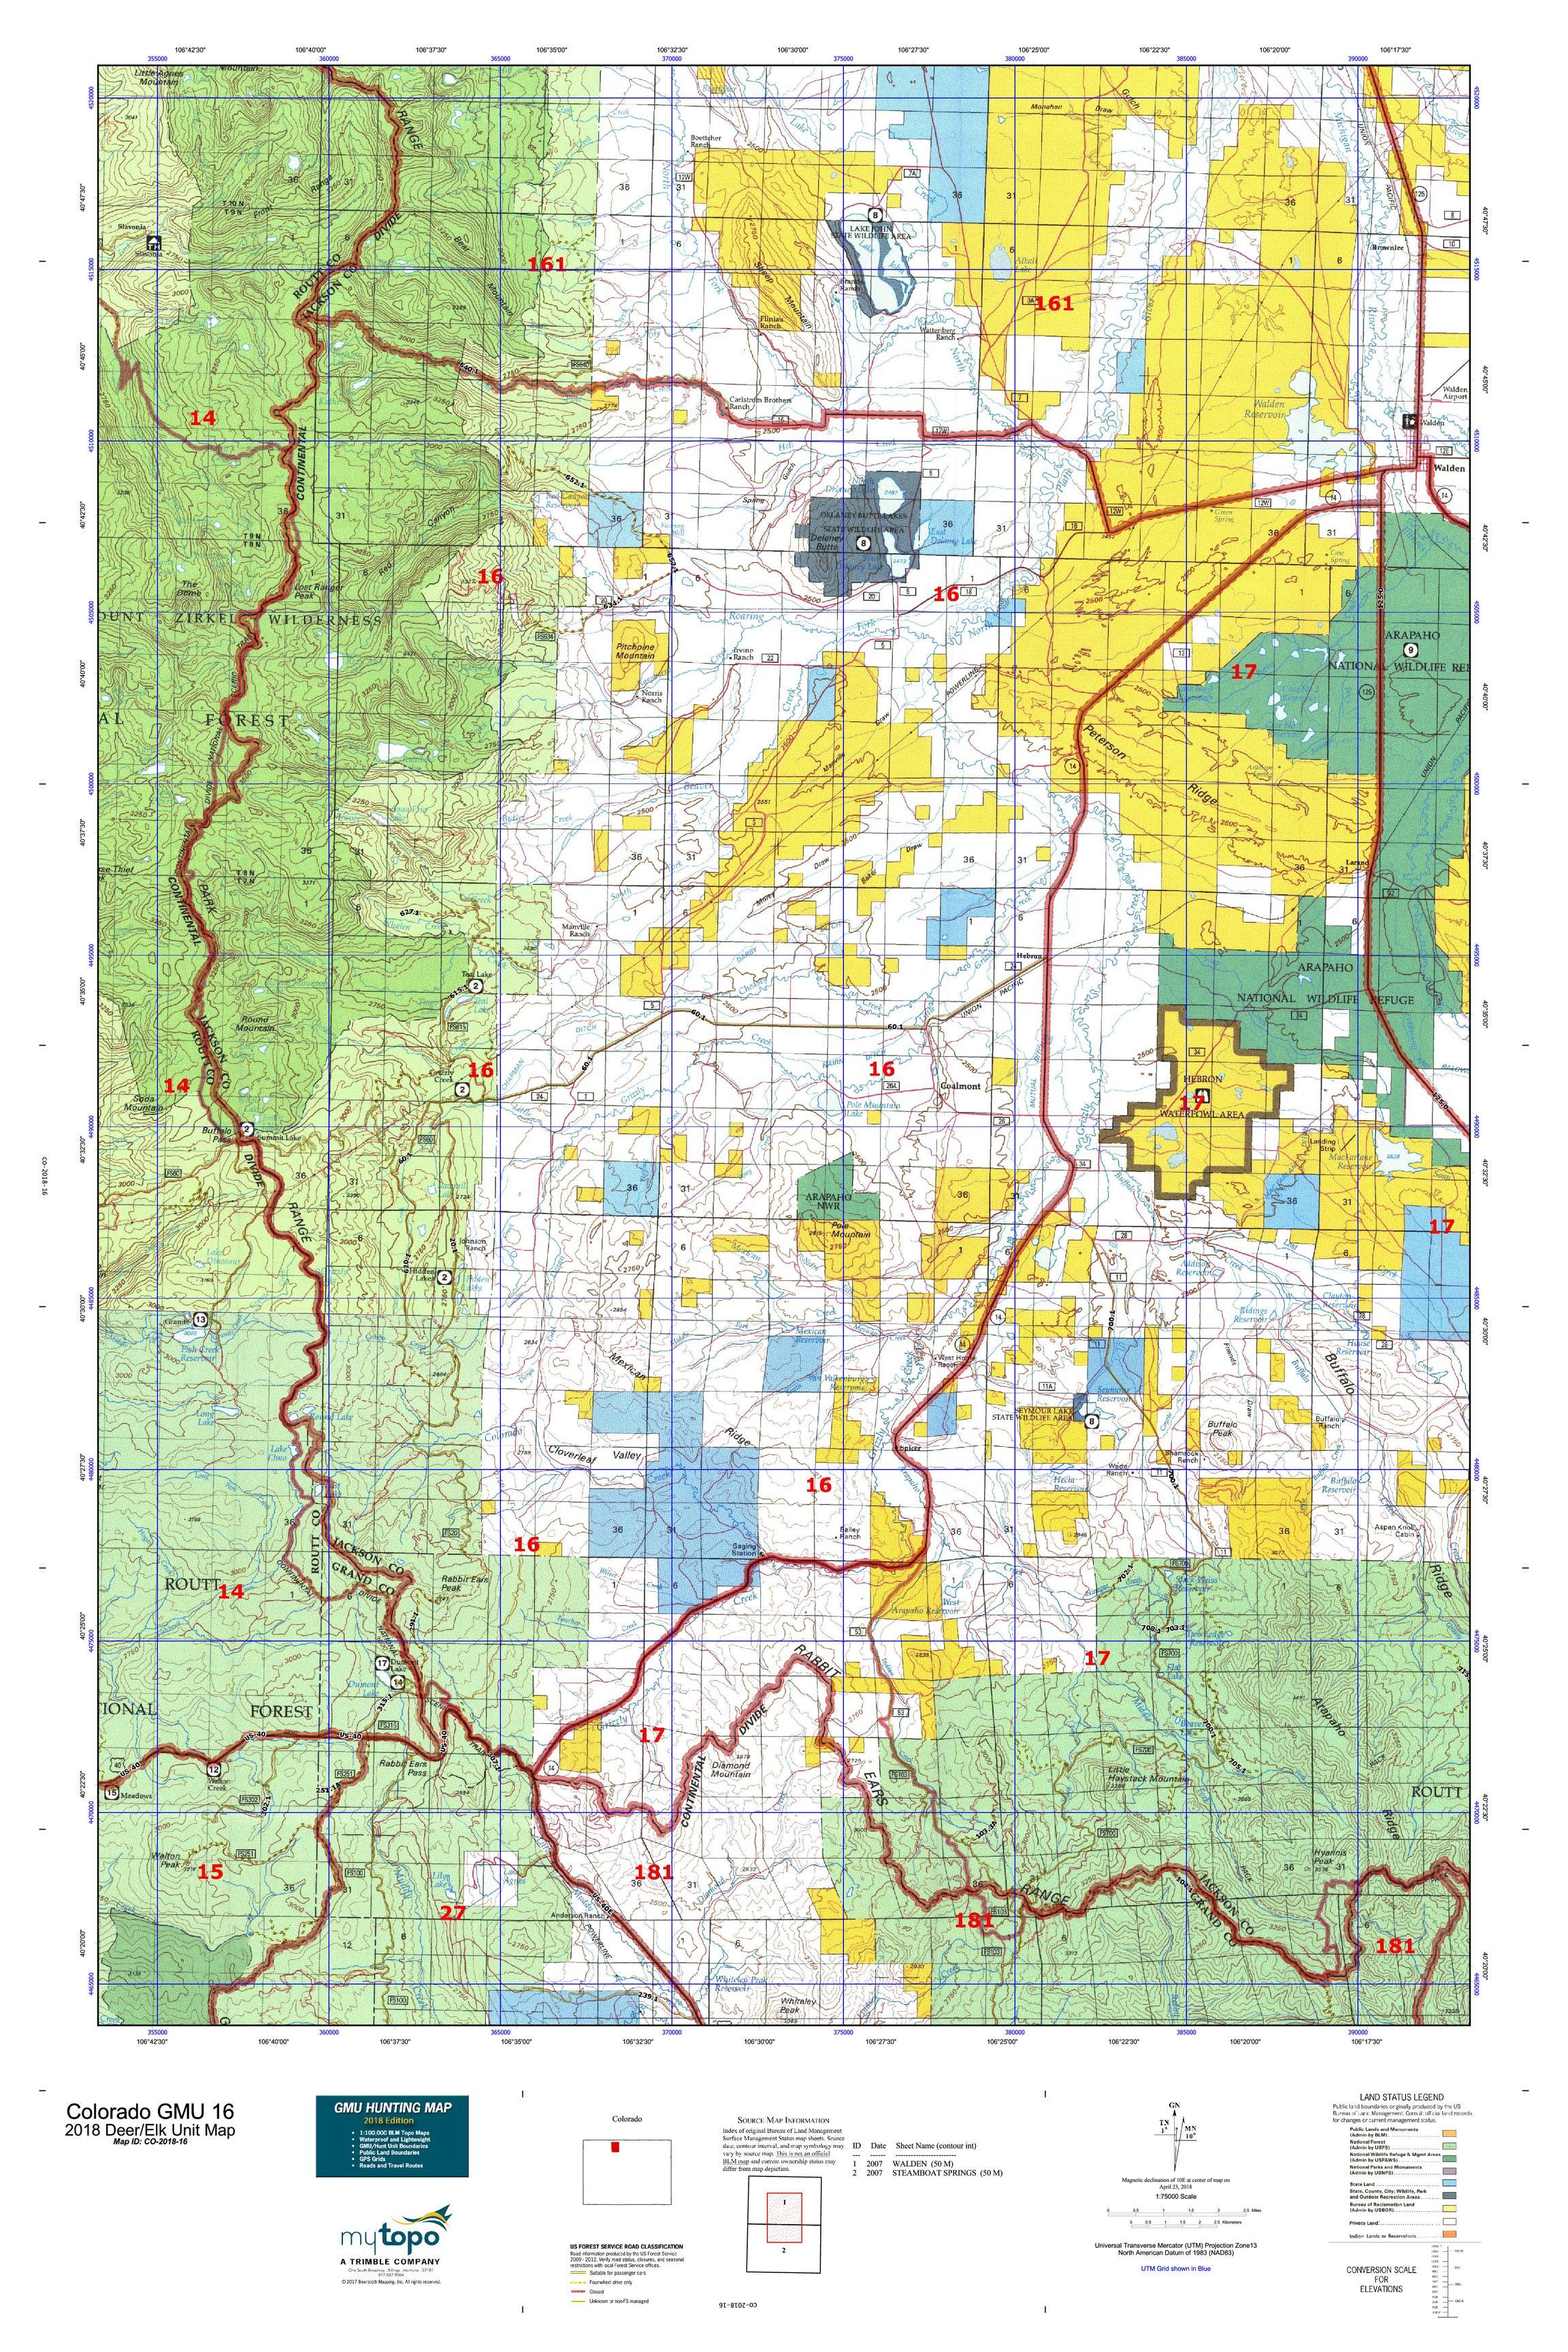 Colorado GMU 16 Map | MyTopo